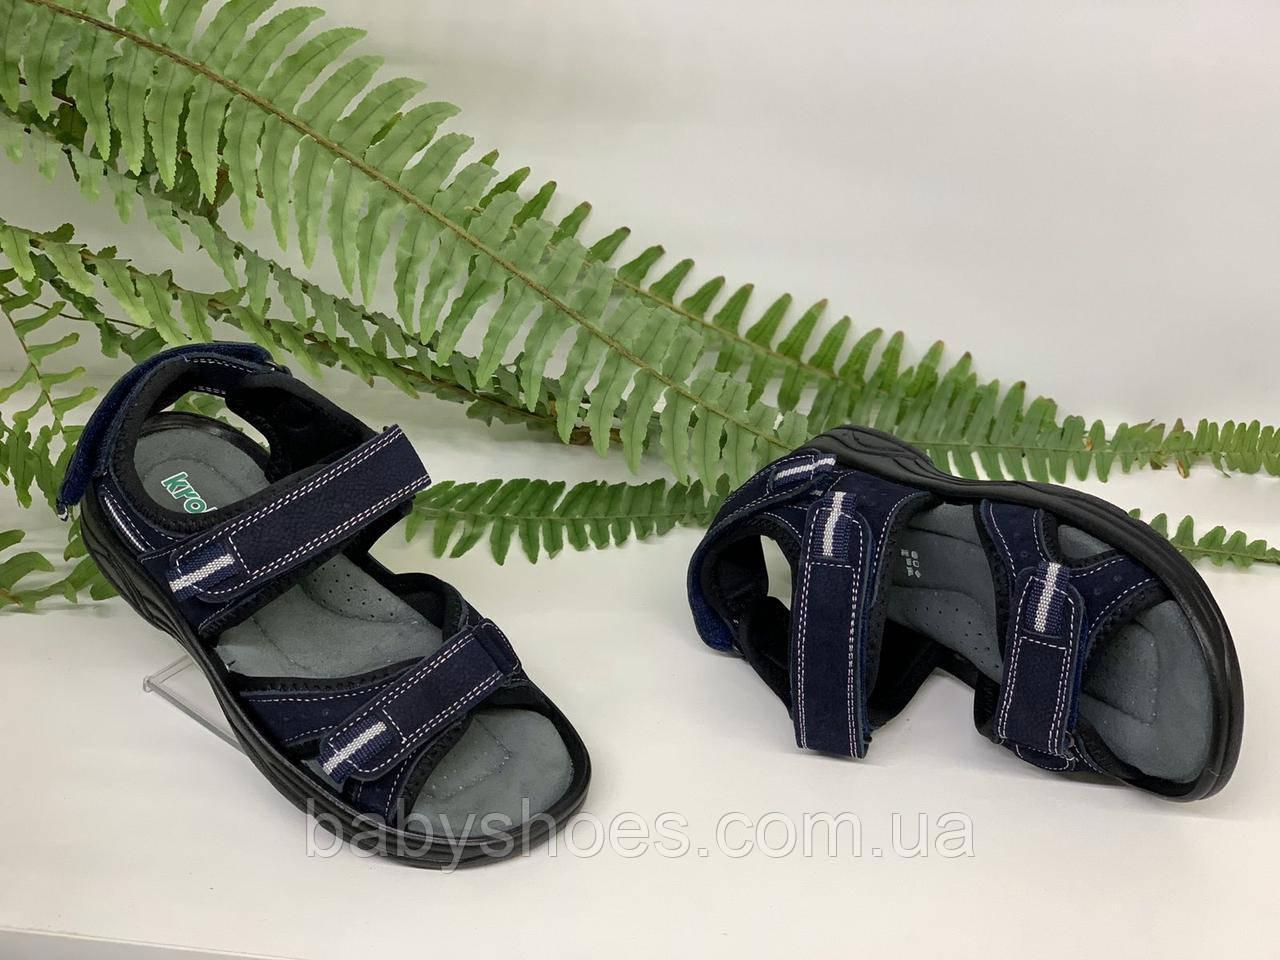 Кожаные босоножки, сандалии Krokky р.36-40. Арт.7613013